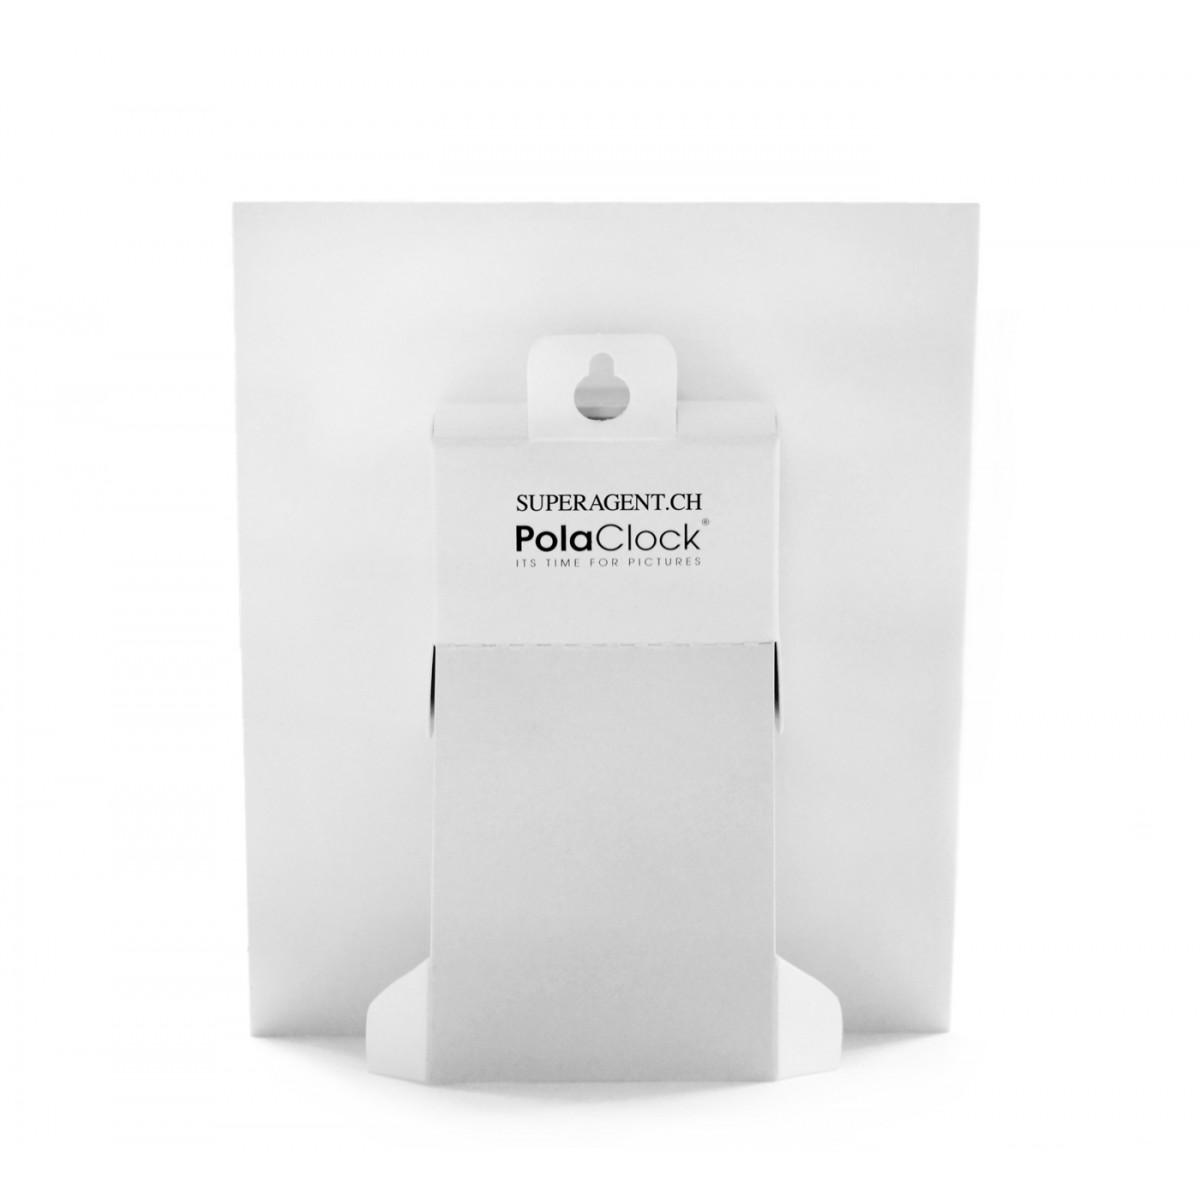 "PolaClock ""POS-NEG"" Wanduhr / Tischuhr im Polaroid-Look by Loreen Hinz"